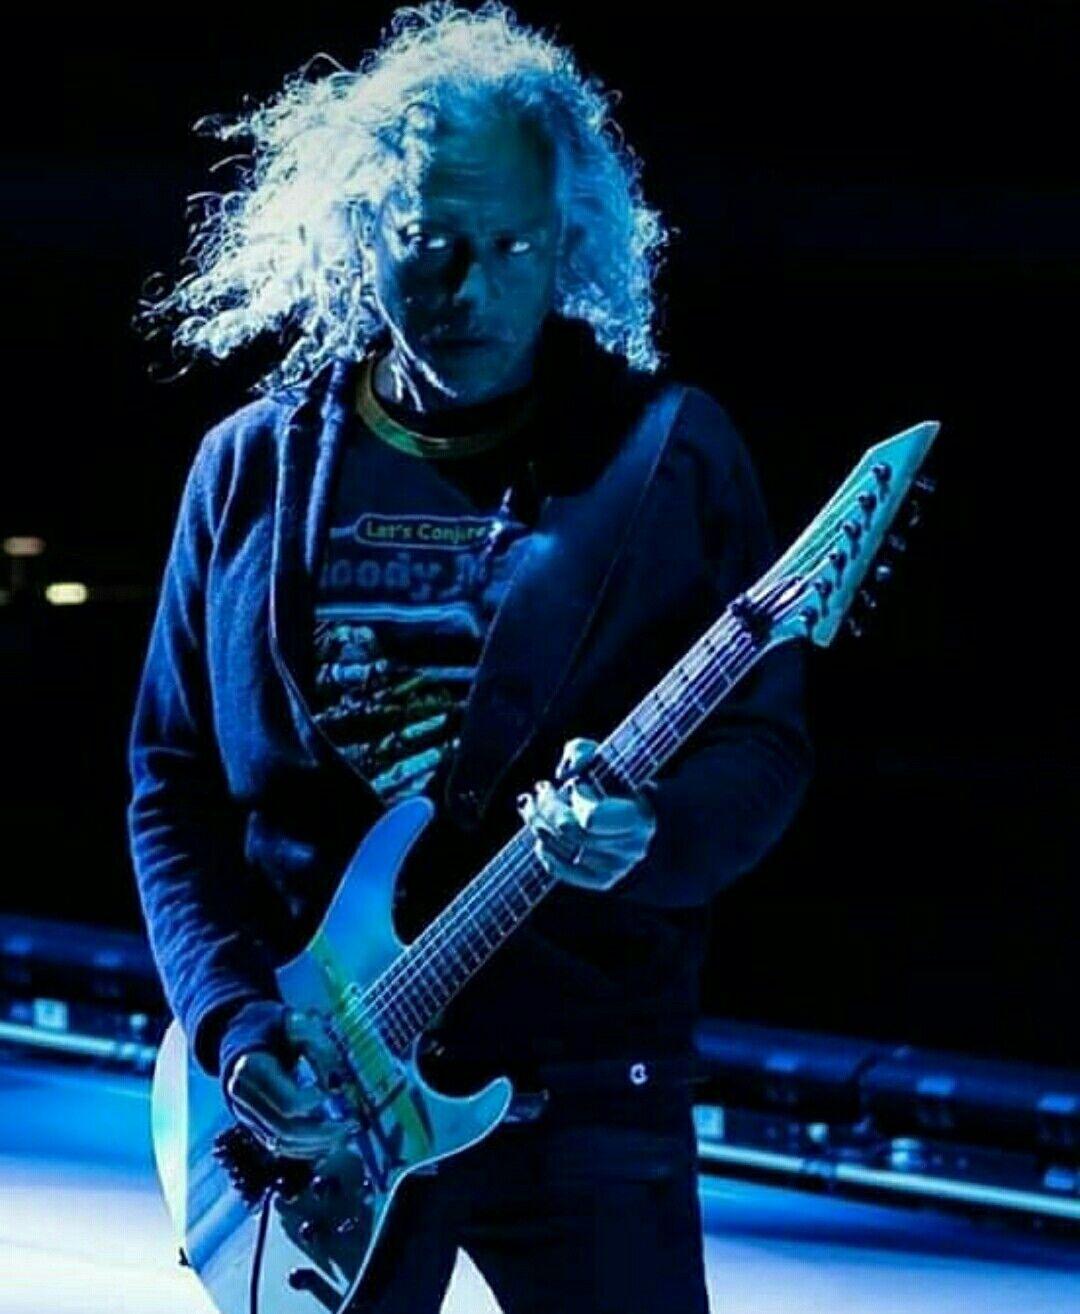 Pin by John Ryan on Metallica in 2019 | Metal bands, Kirk